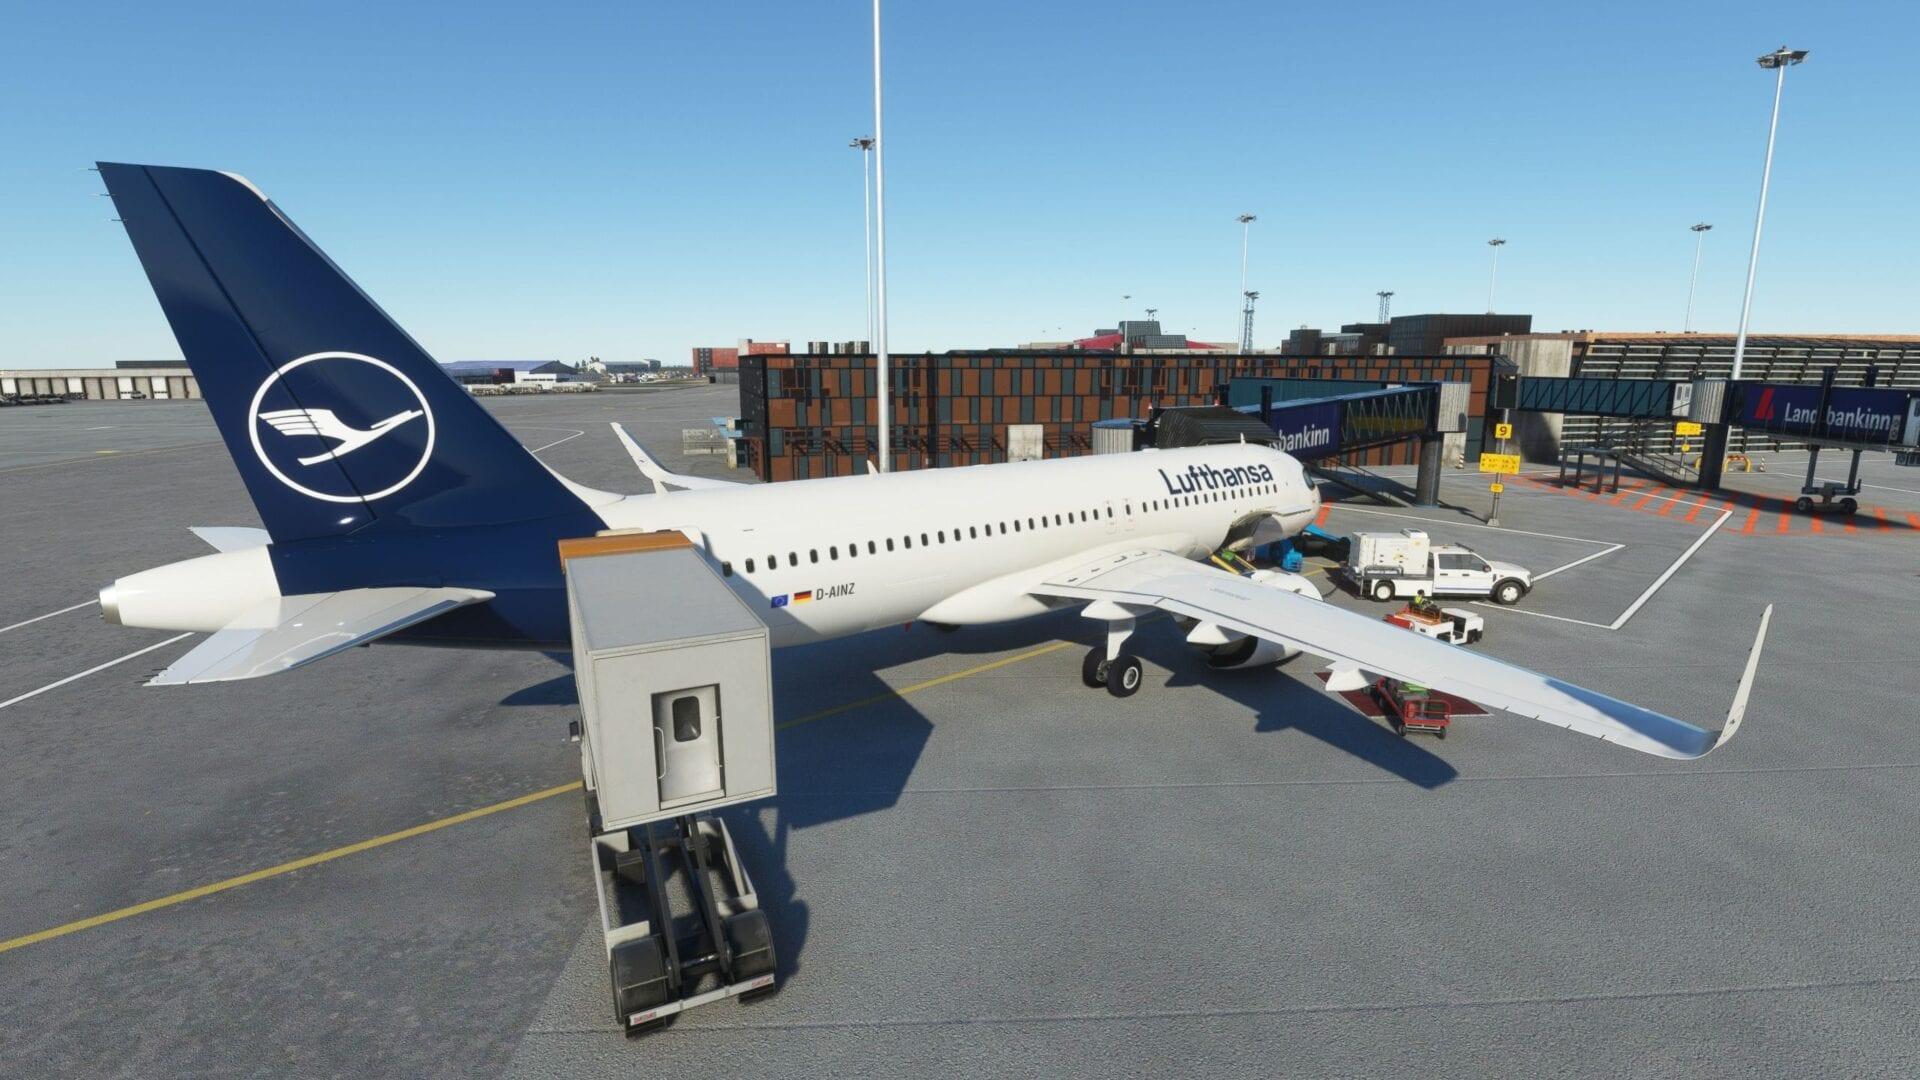 Microsoft Flight Simulator Keflavik